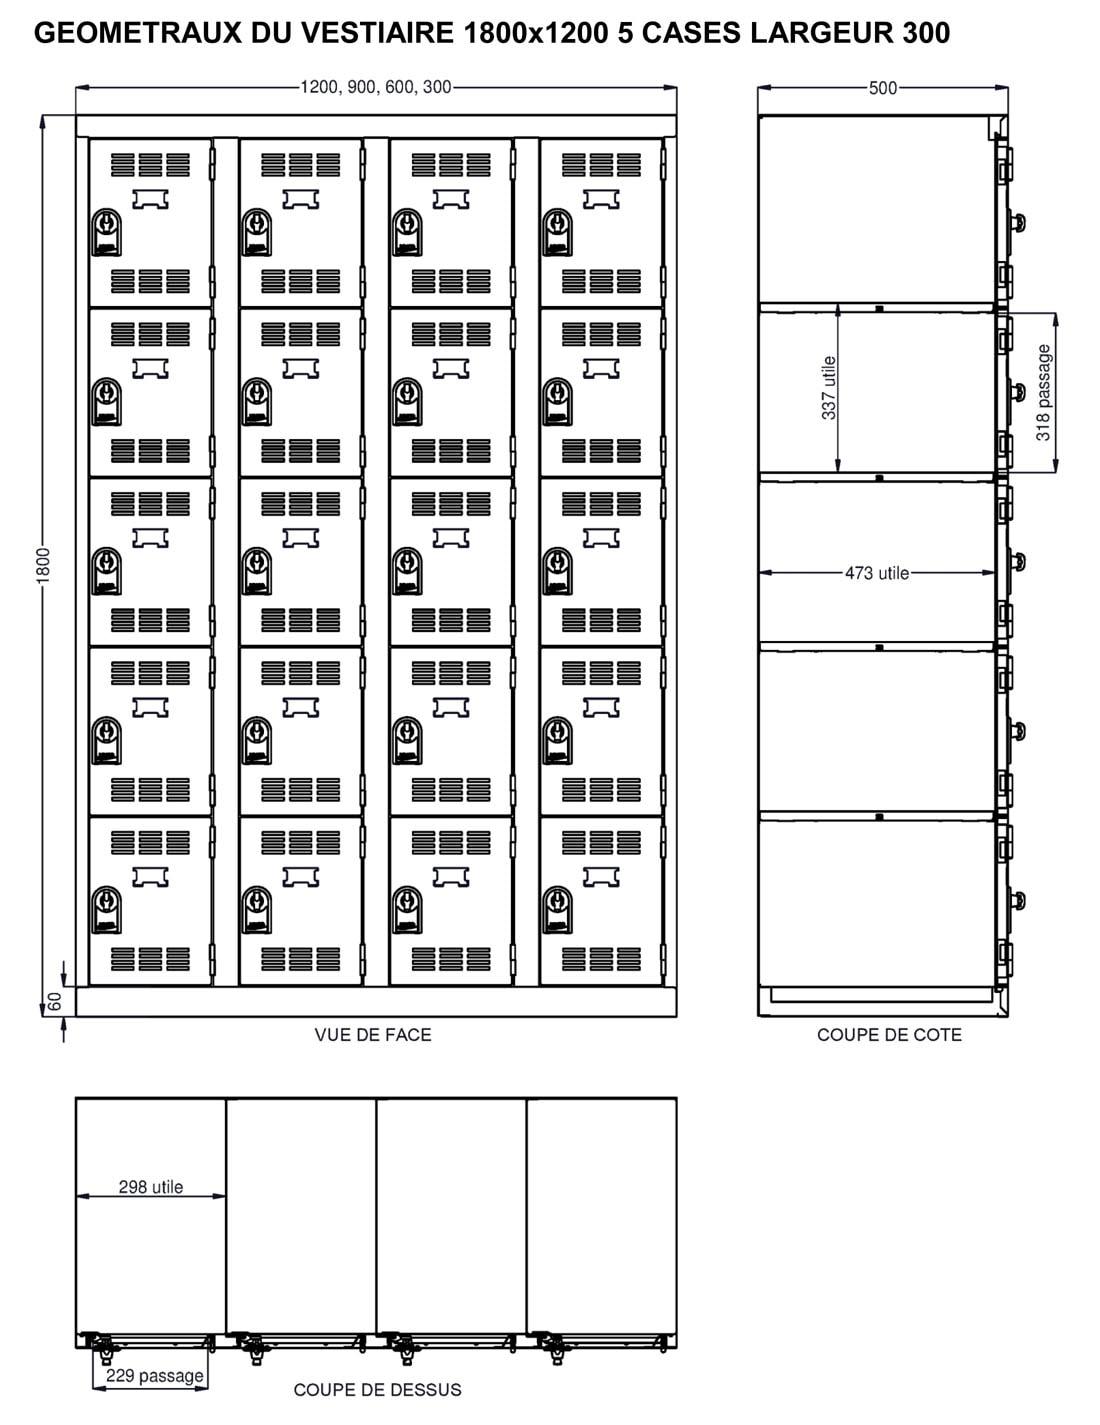 Dimensions utiles du vestiaire 5 cases